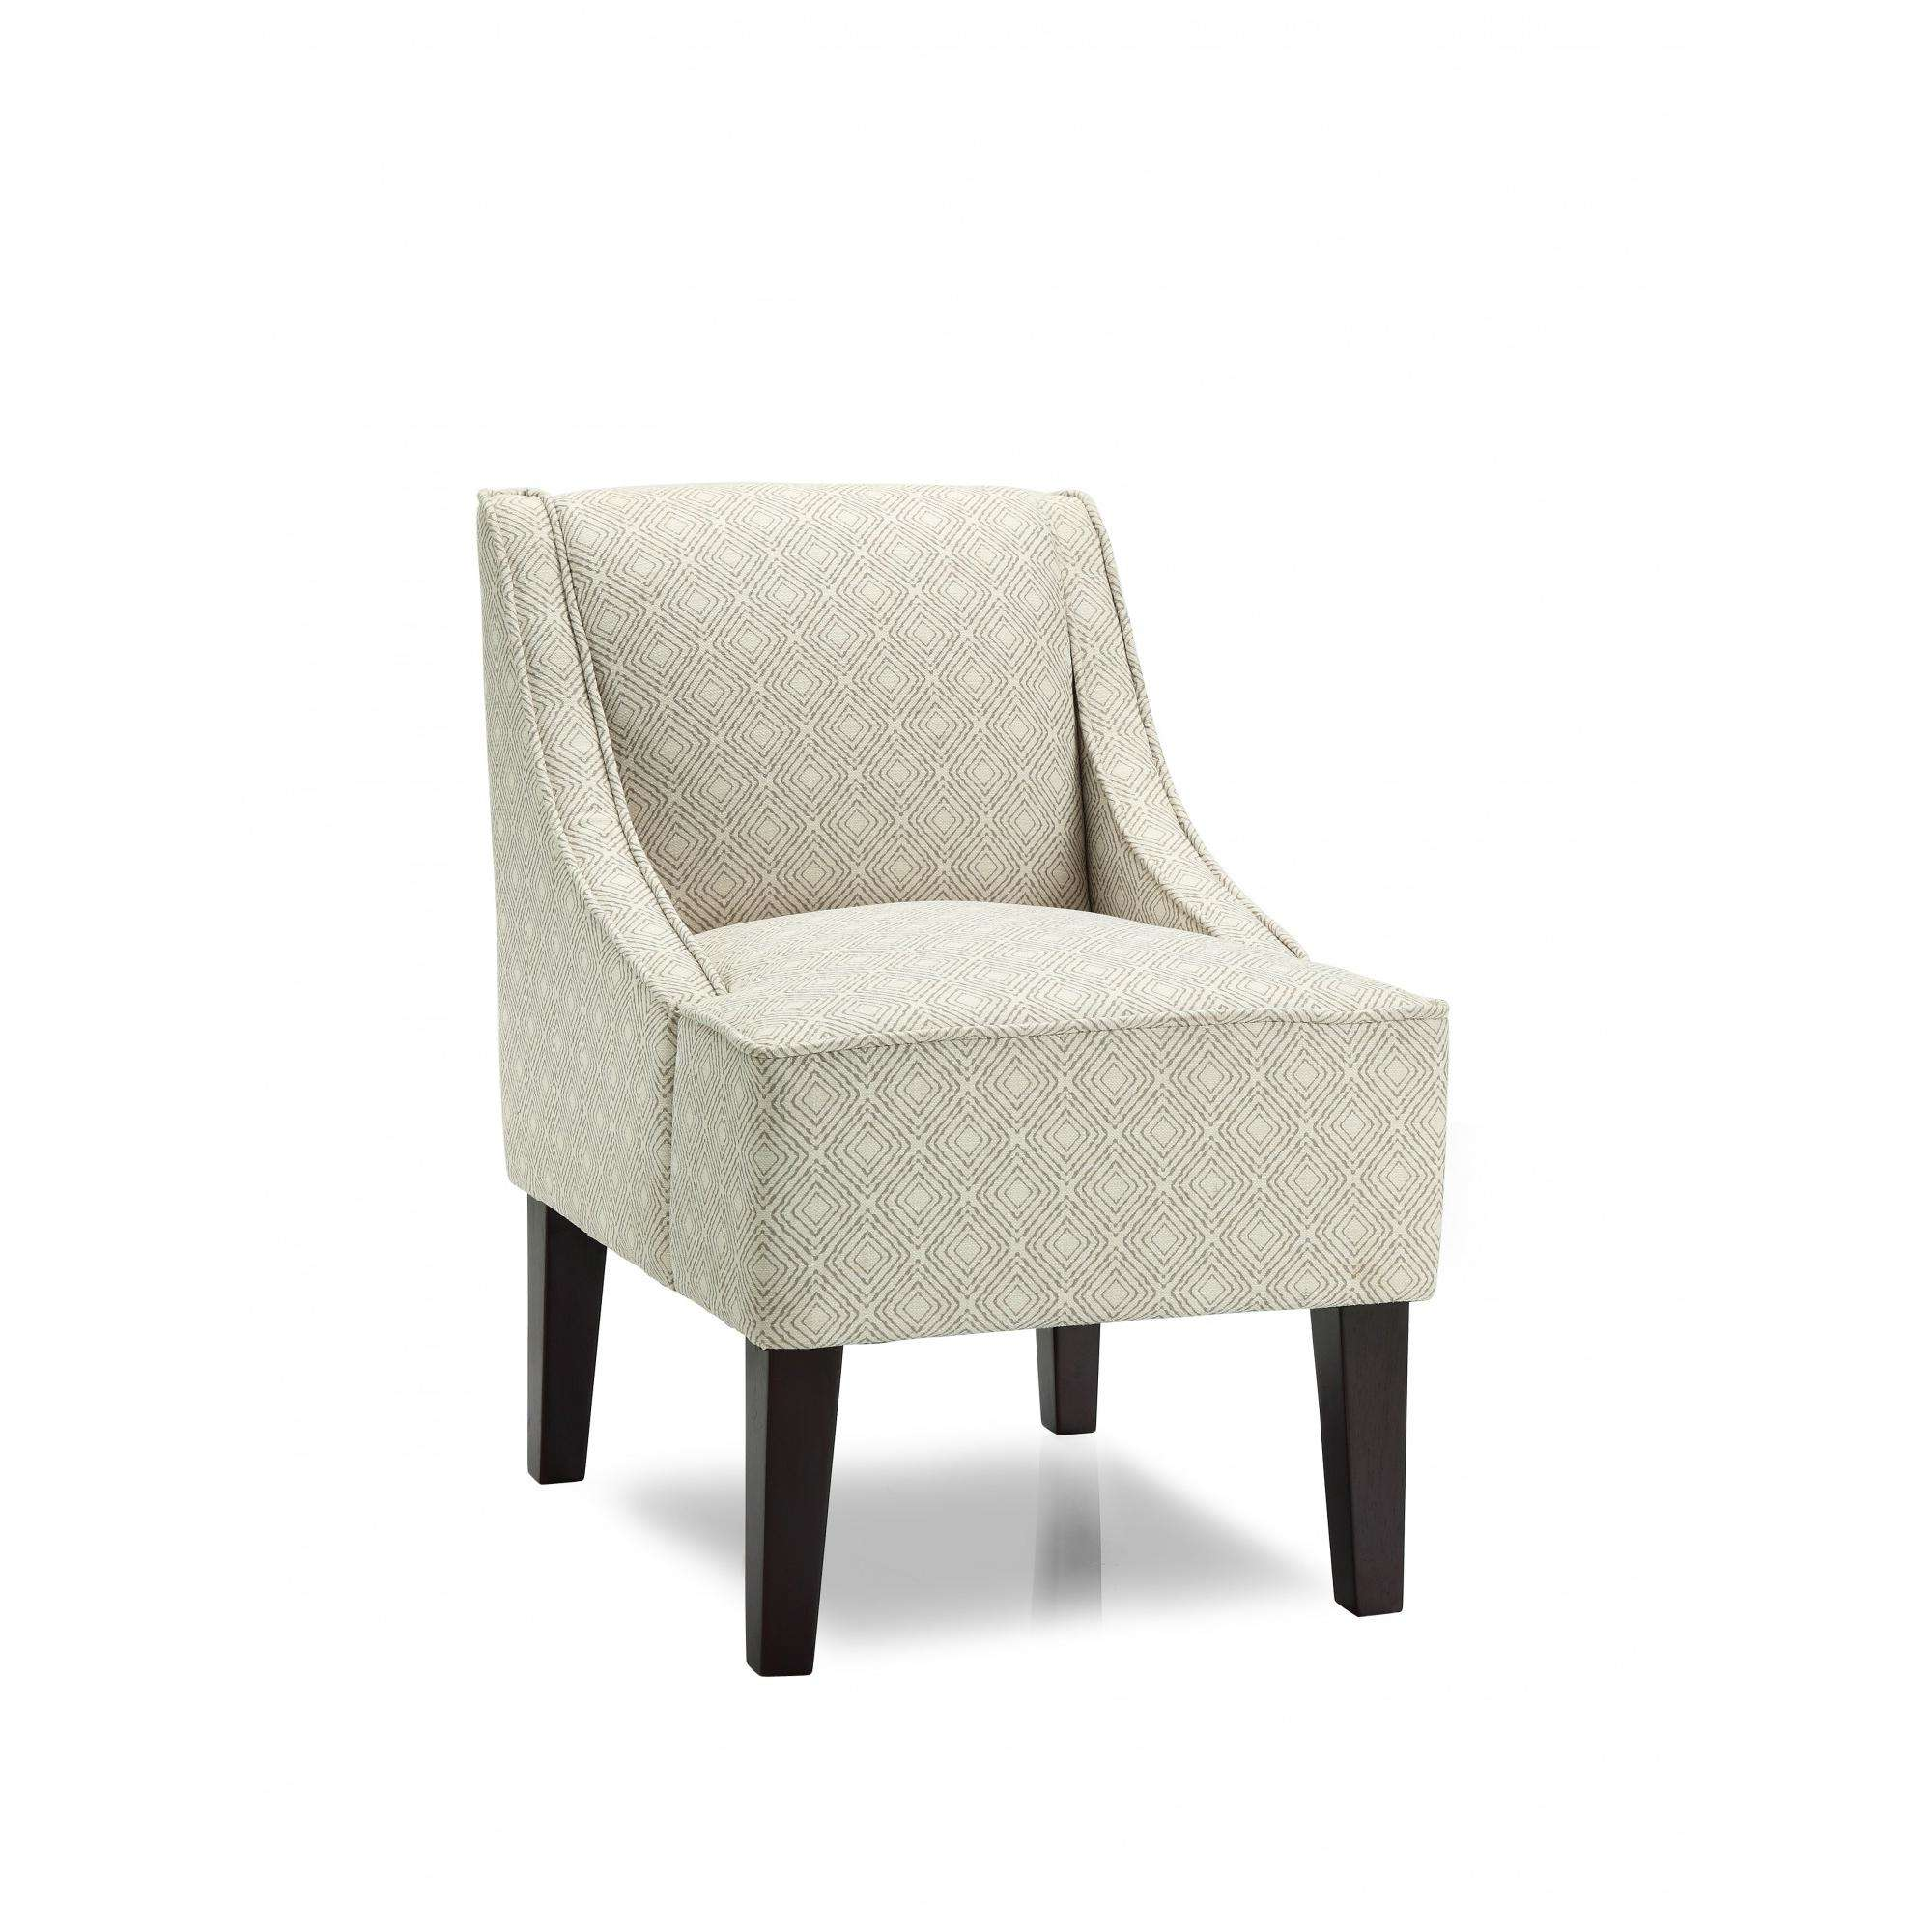 Phoenix Gigi Upholstered Accent Chair, Multiple Colors